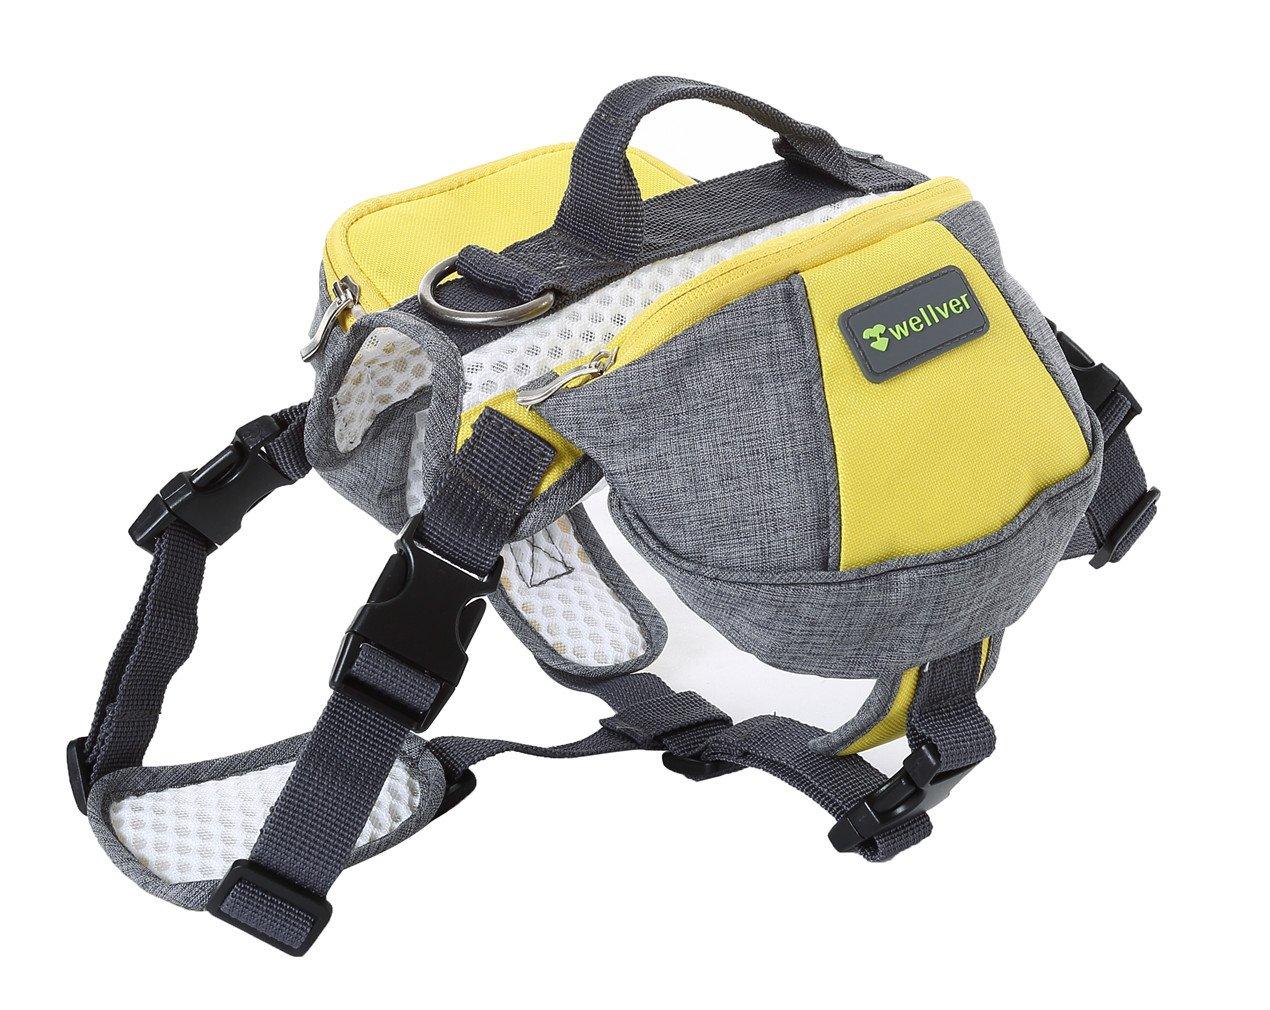 M Wellver Dog Backpacks Saddle Bag Outdoor Dog Packs for Hiking Walking Camping,M